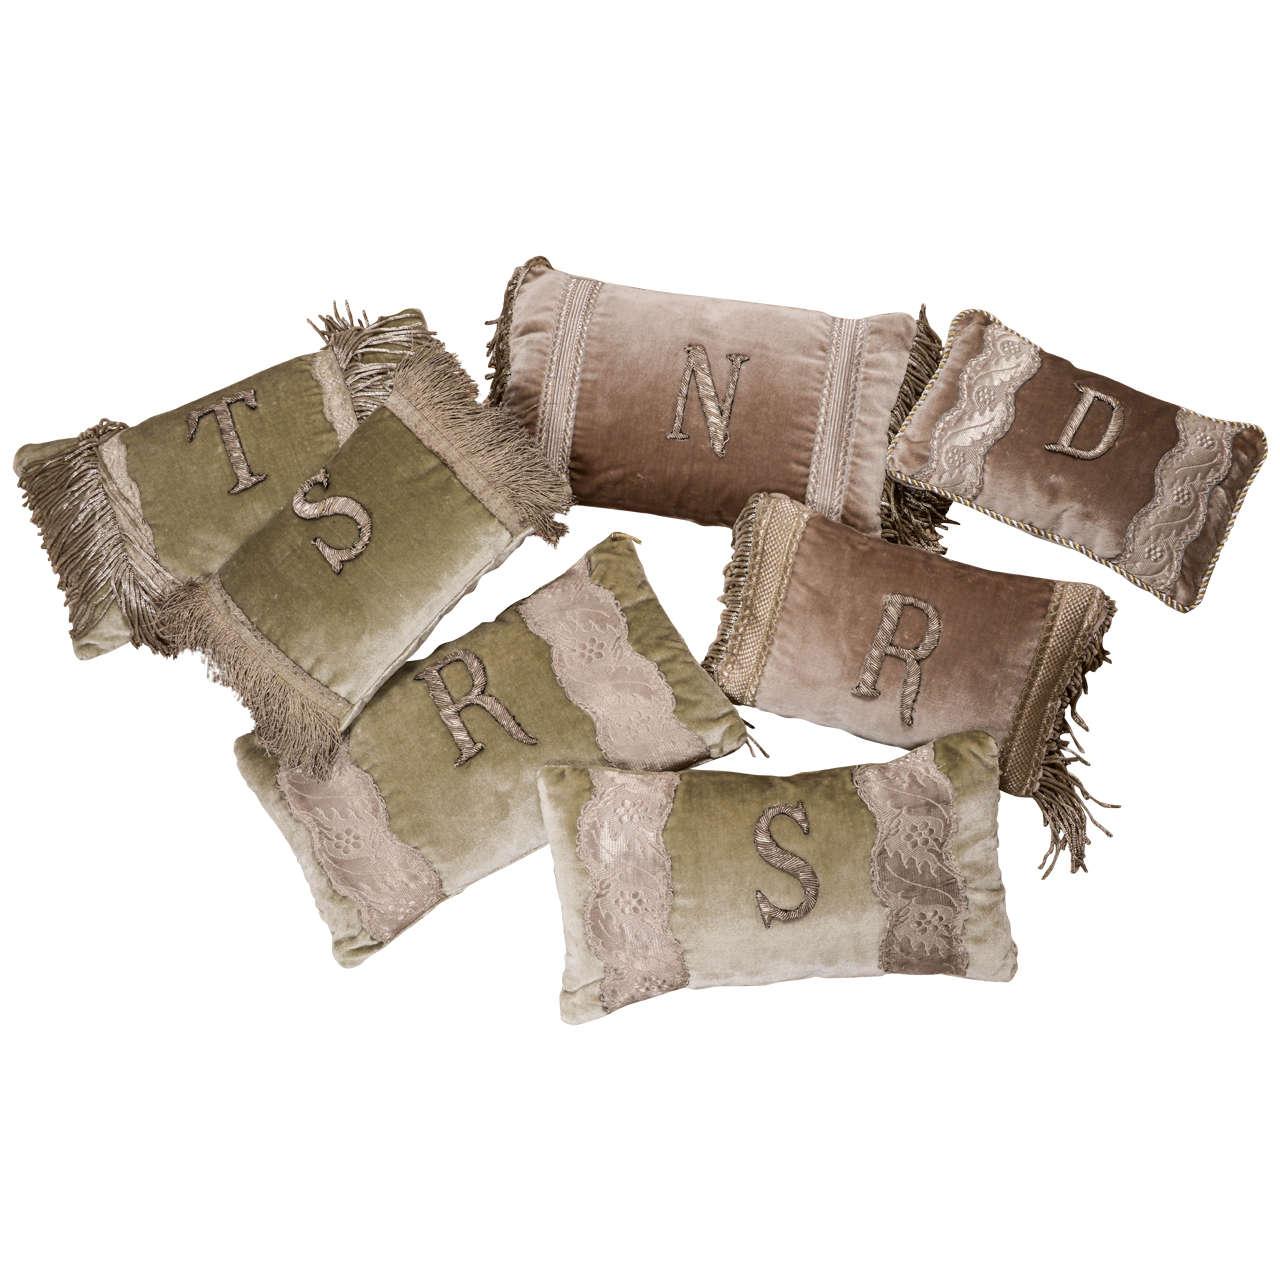 Antique Metallic Applique Initial Pillows For Sale